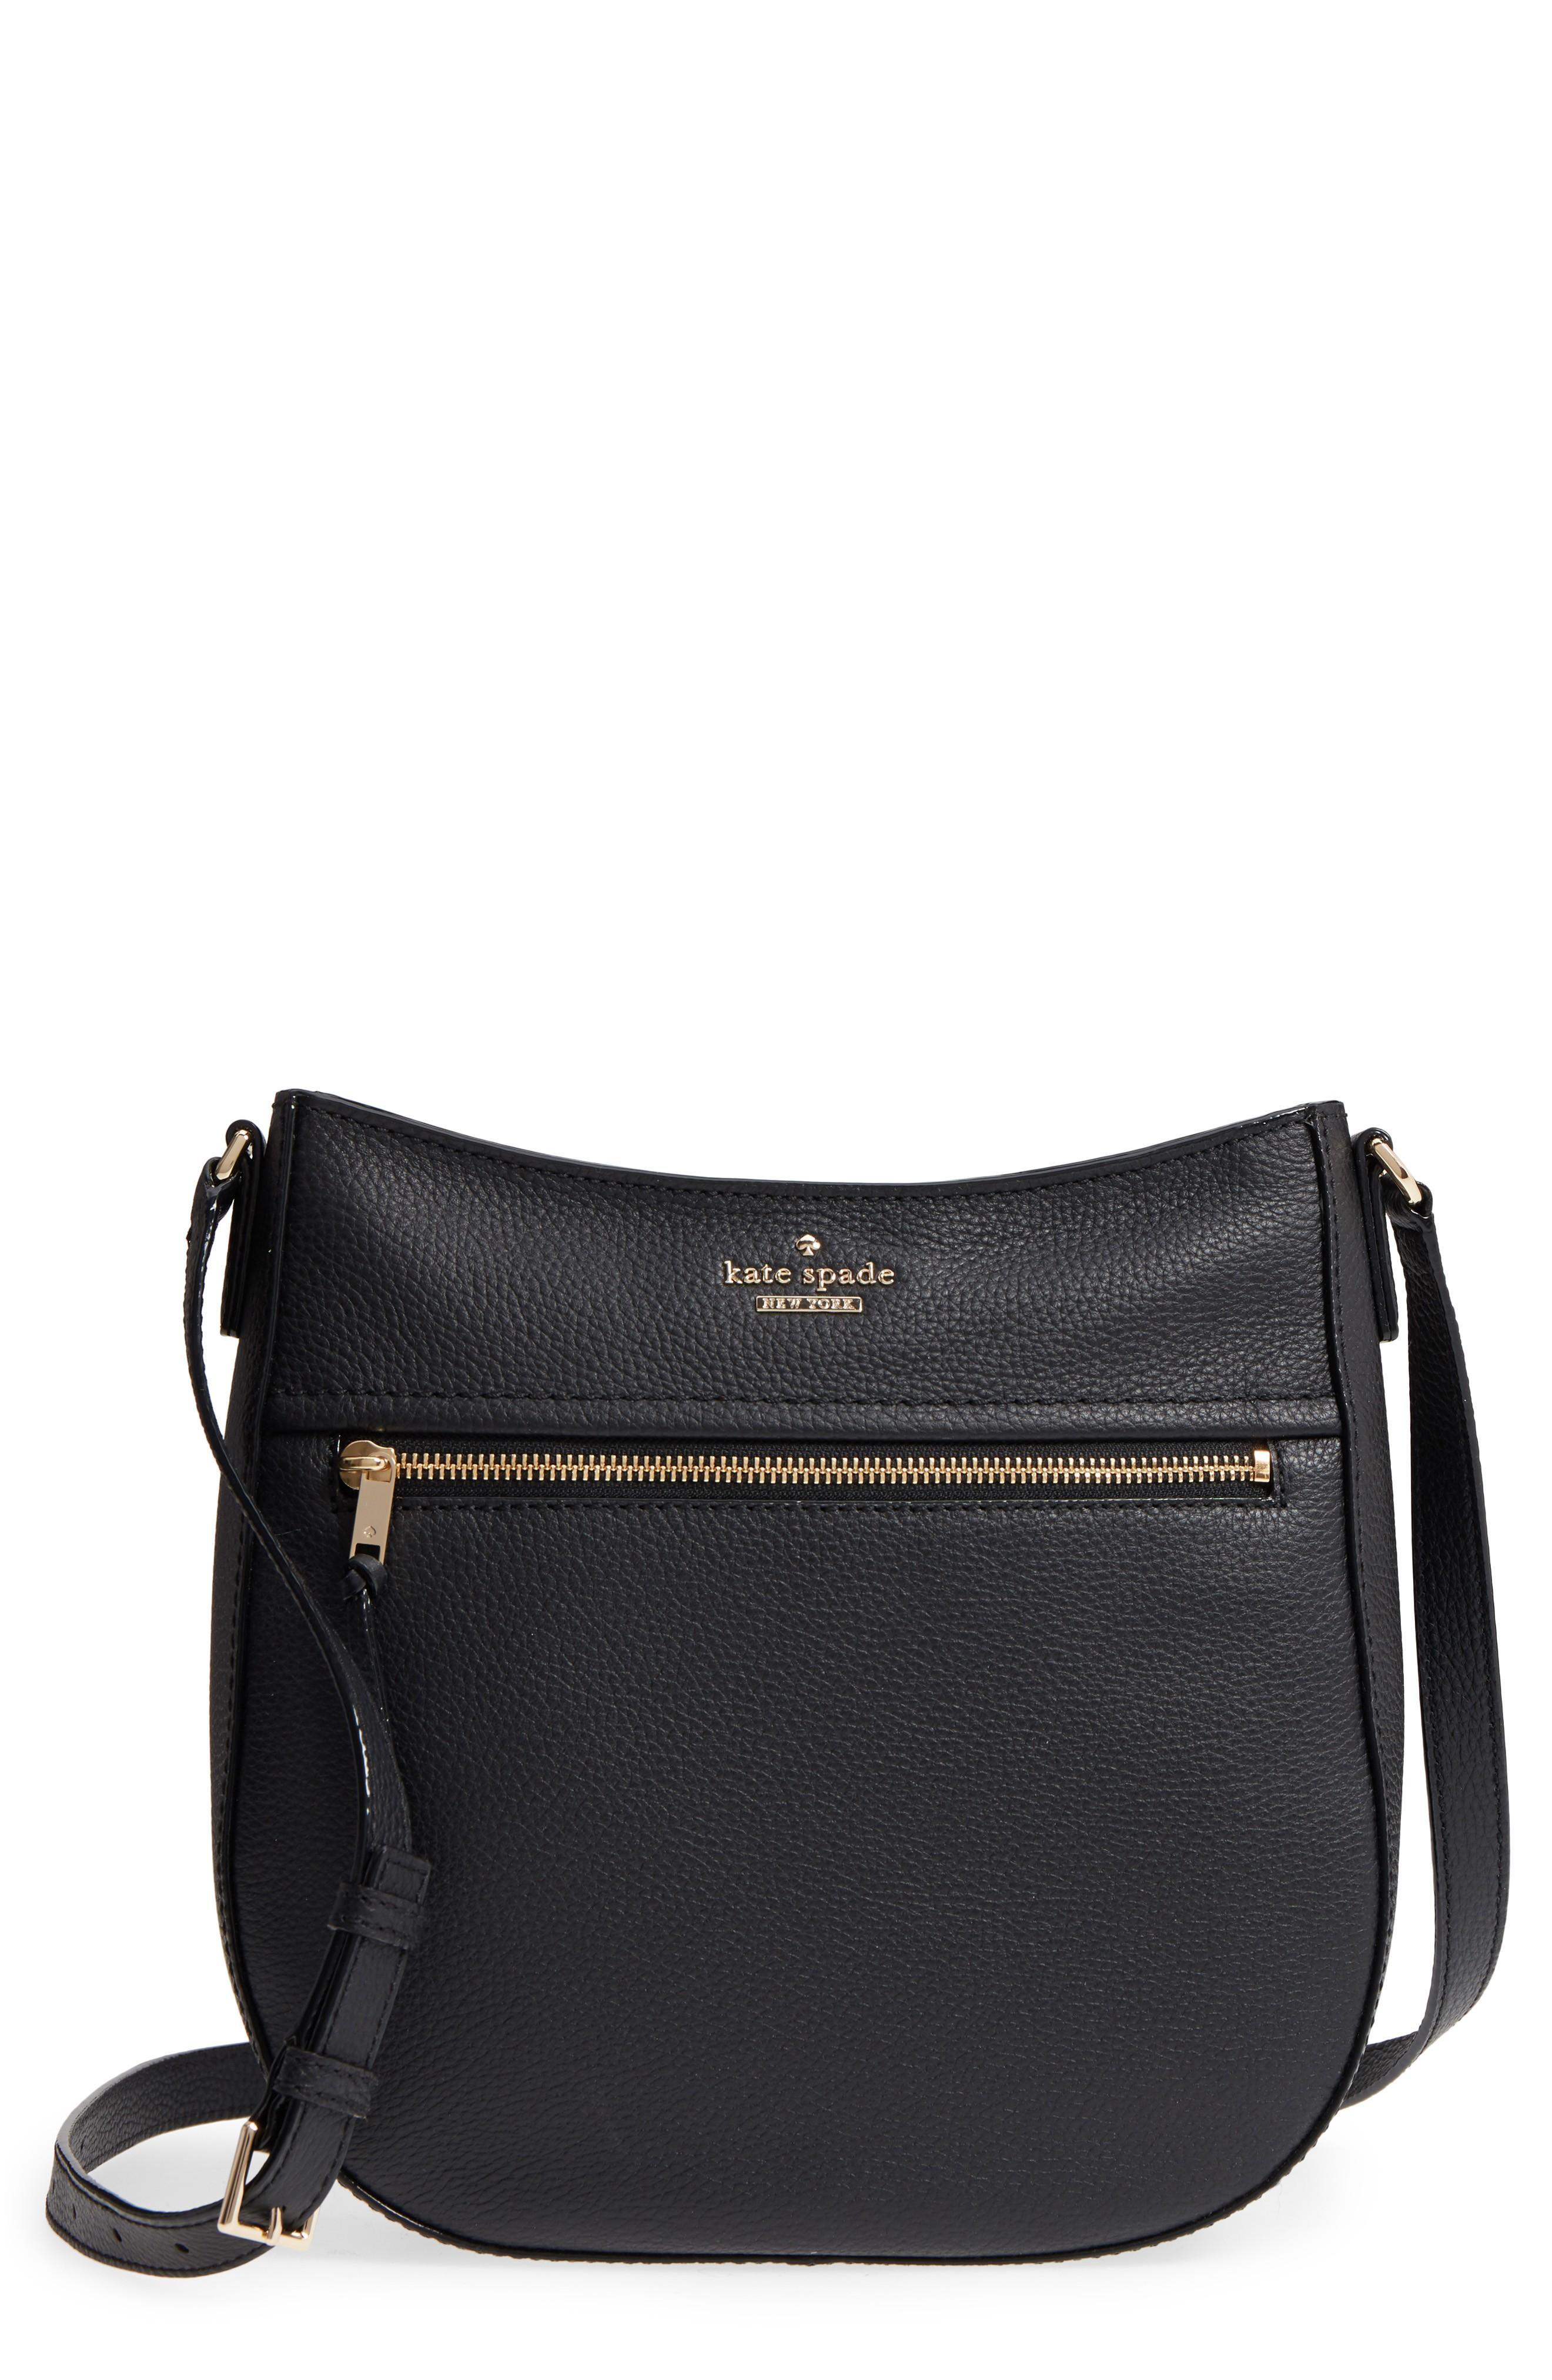 Kate Spade Jackson Street - Robin Leather Crossbody Bag - Black ... c8ad8ba8f5a0a